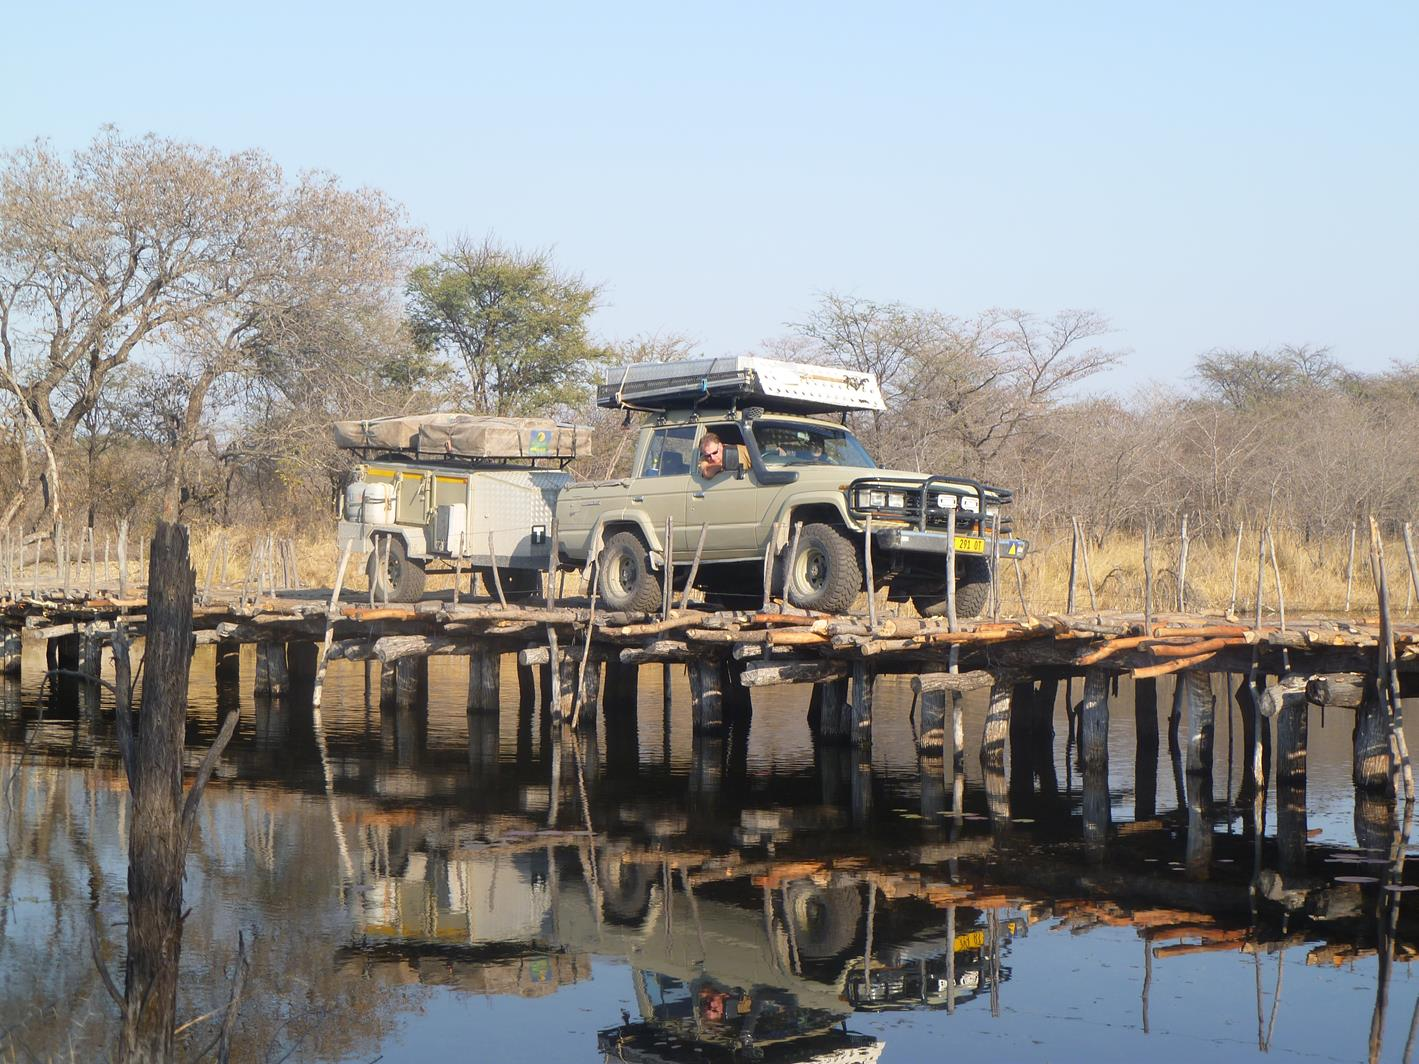 Behelfsbrücke im Caprivi - Sambesi Region - Namibia